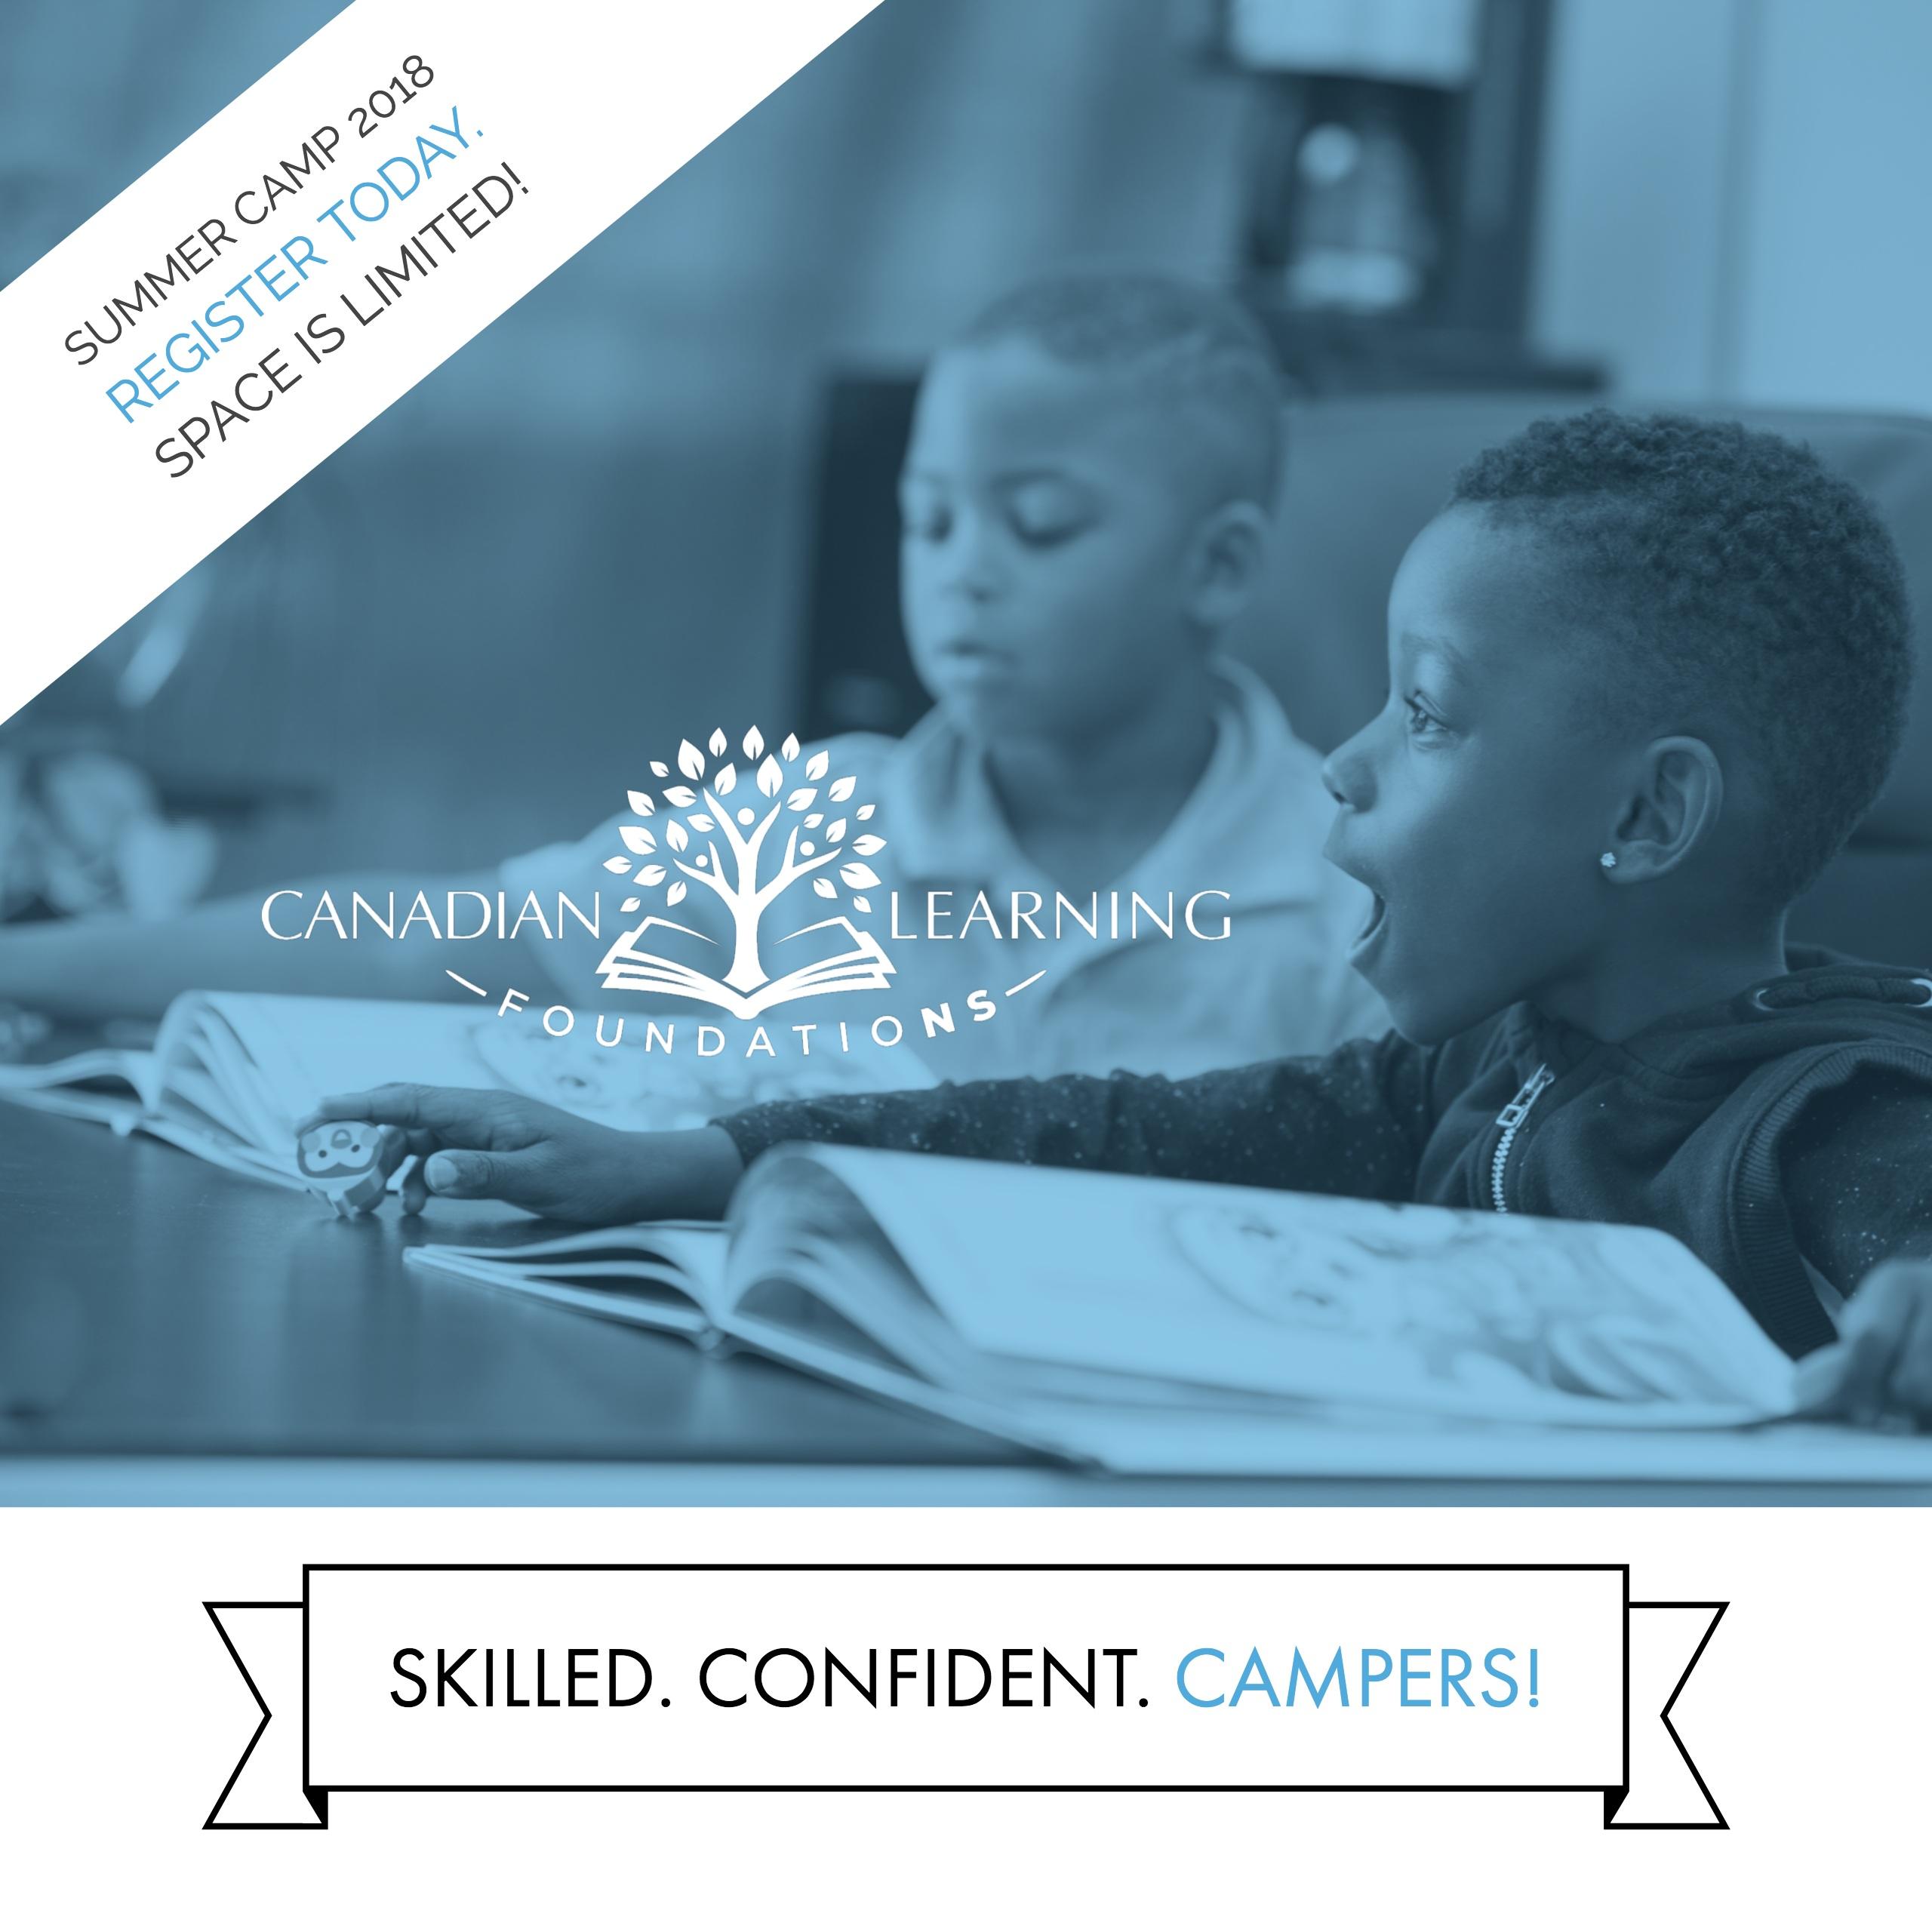 spellread halifax learning tutor tutoring spell read write learn evidence-based reading program literacy